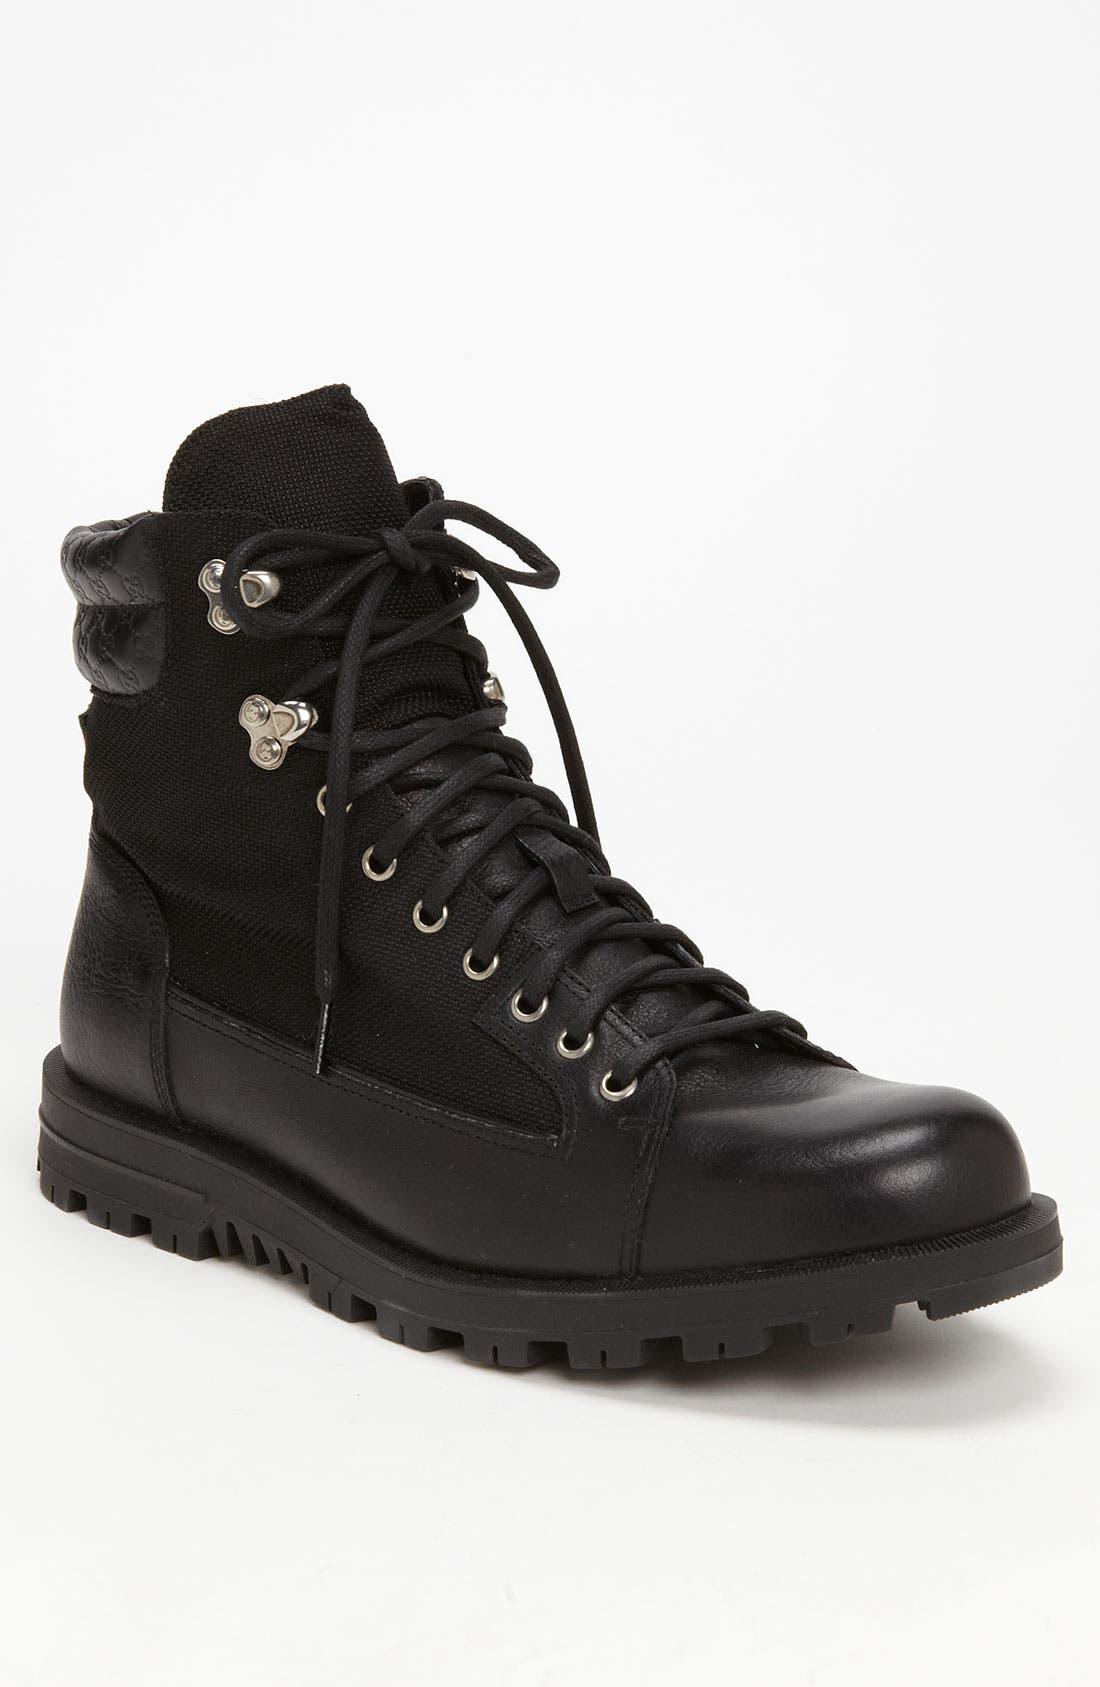 Main Image - Gucci 'Meguro' Combat Boot